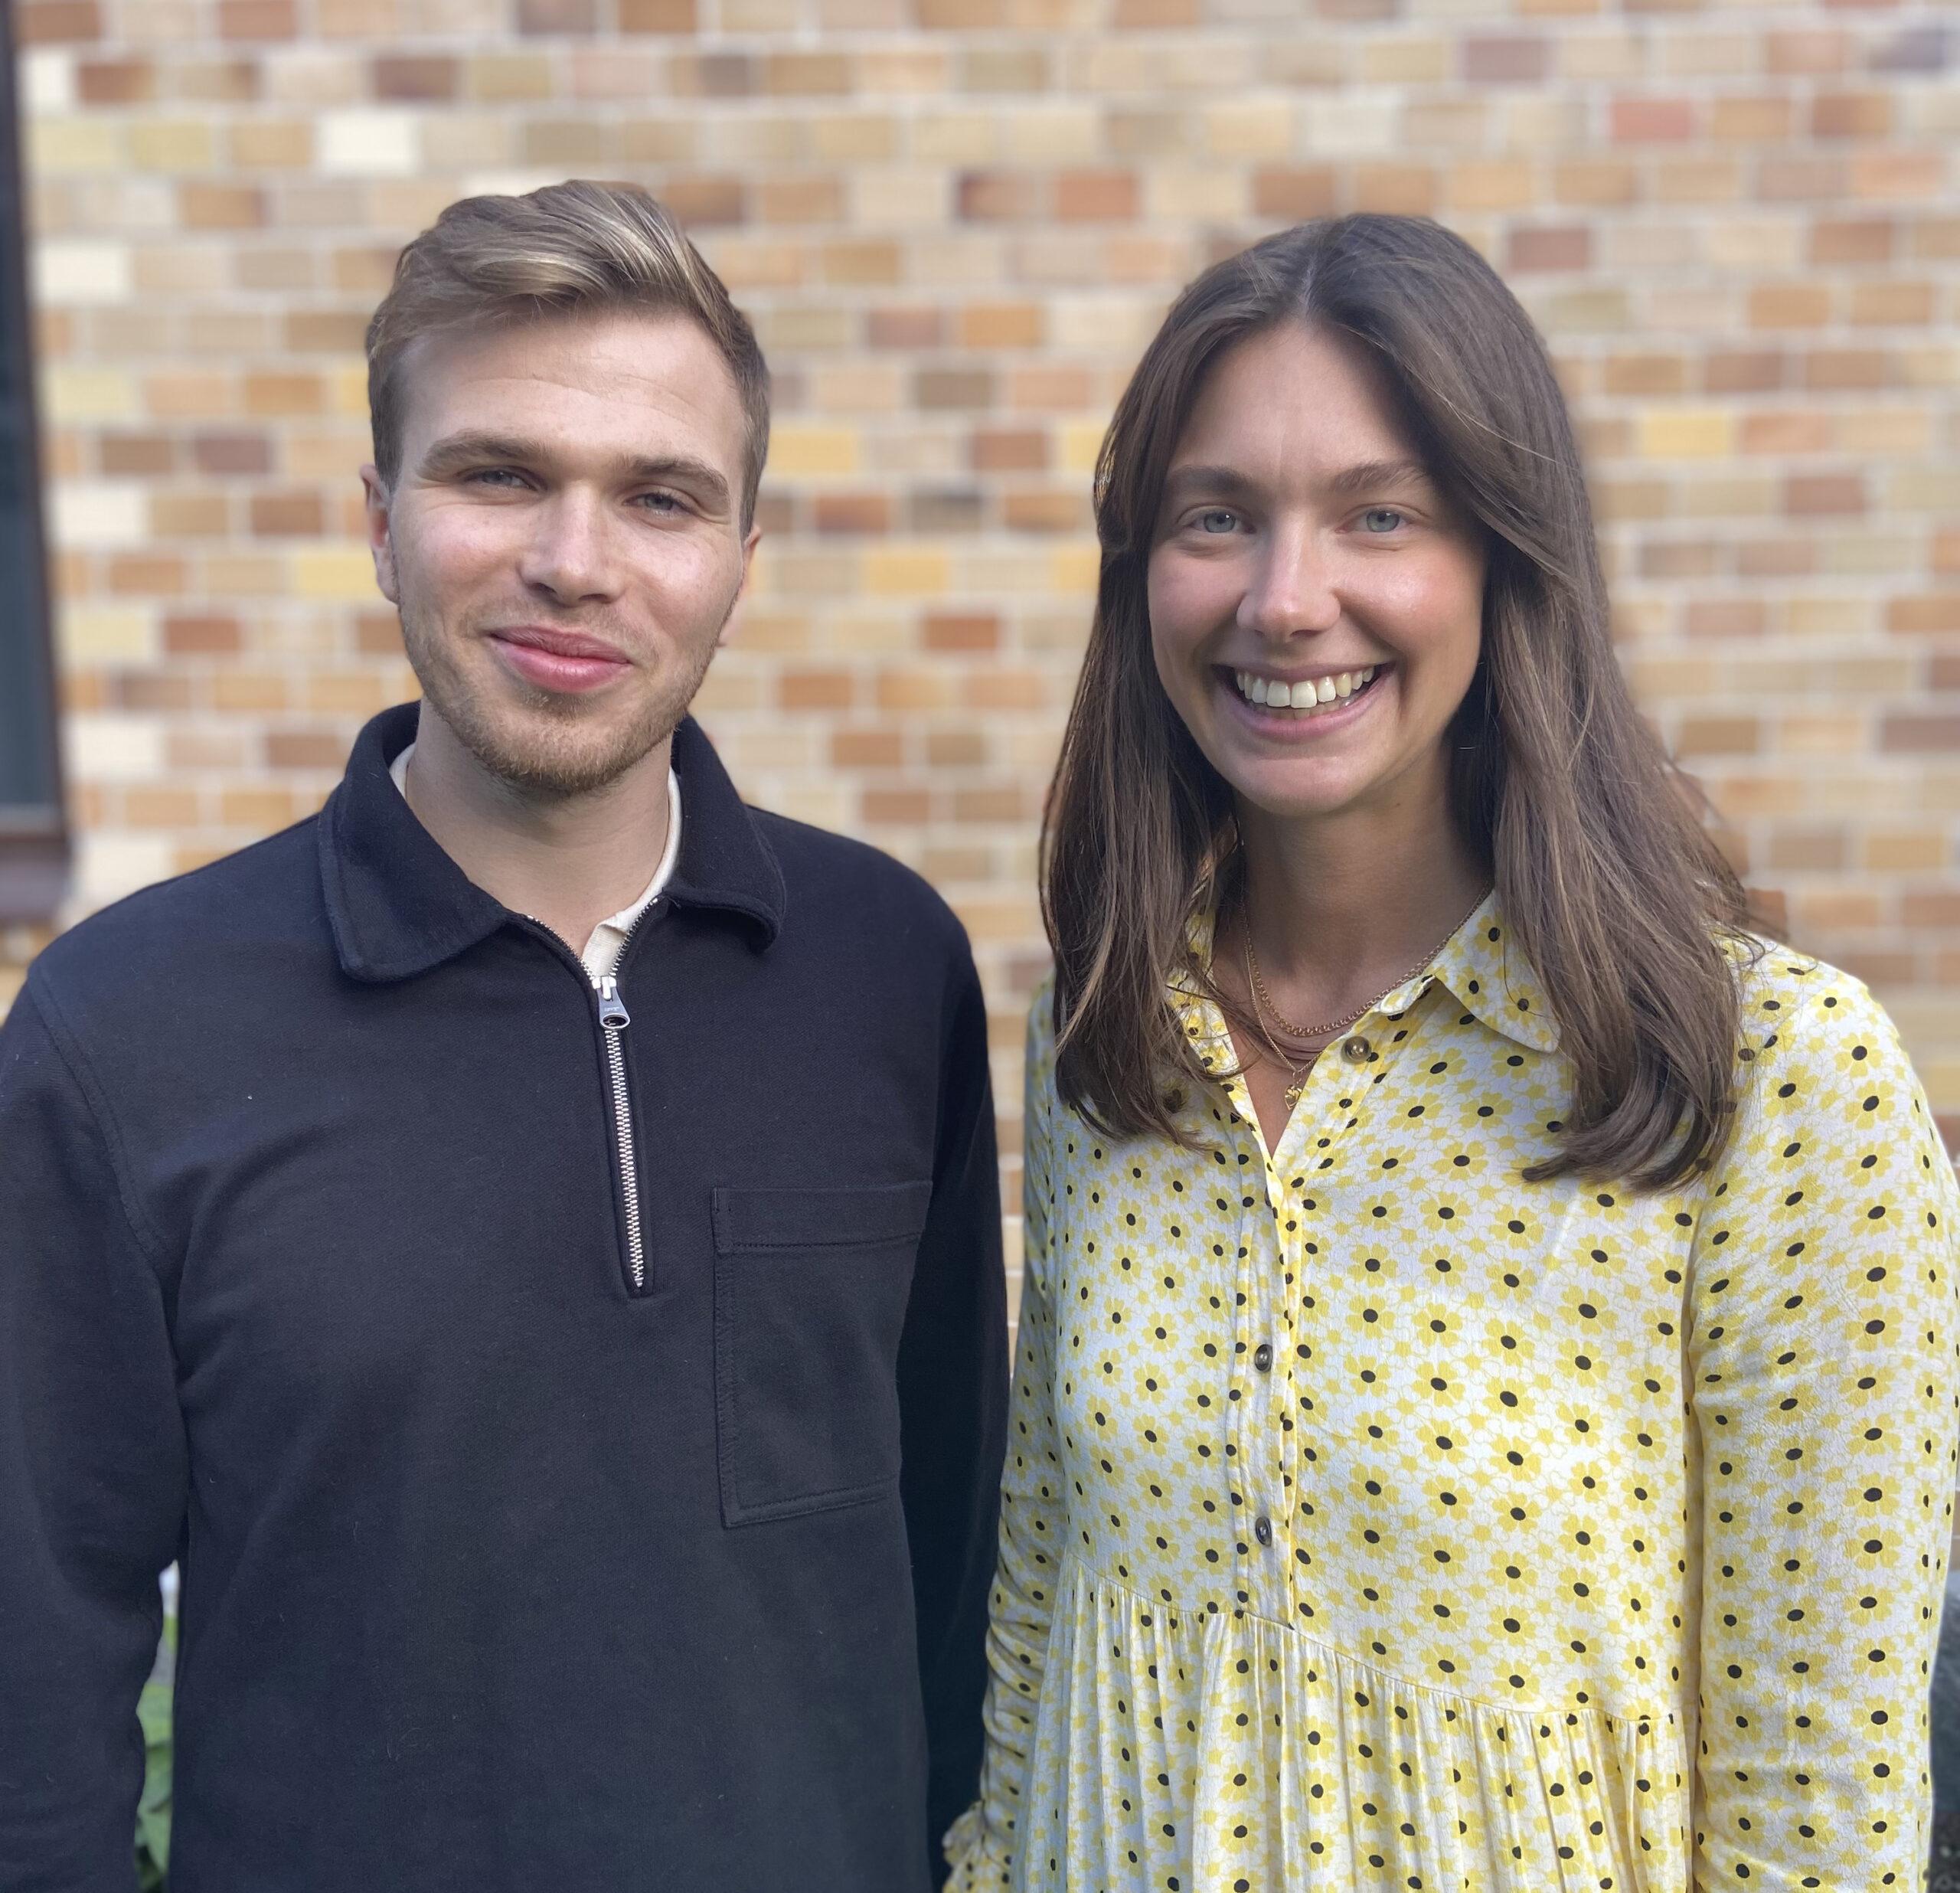 Olivia Westberg And Jacob Nissén Karlsson